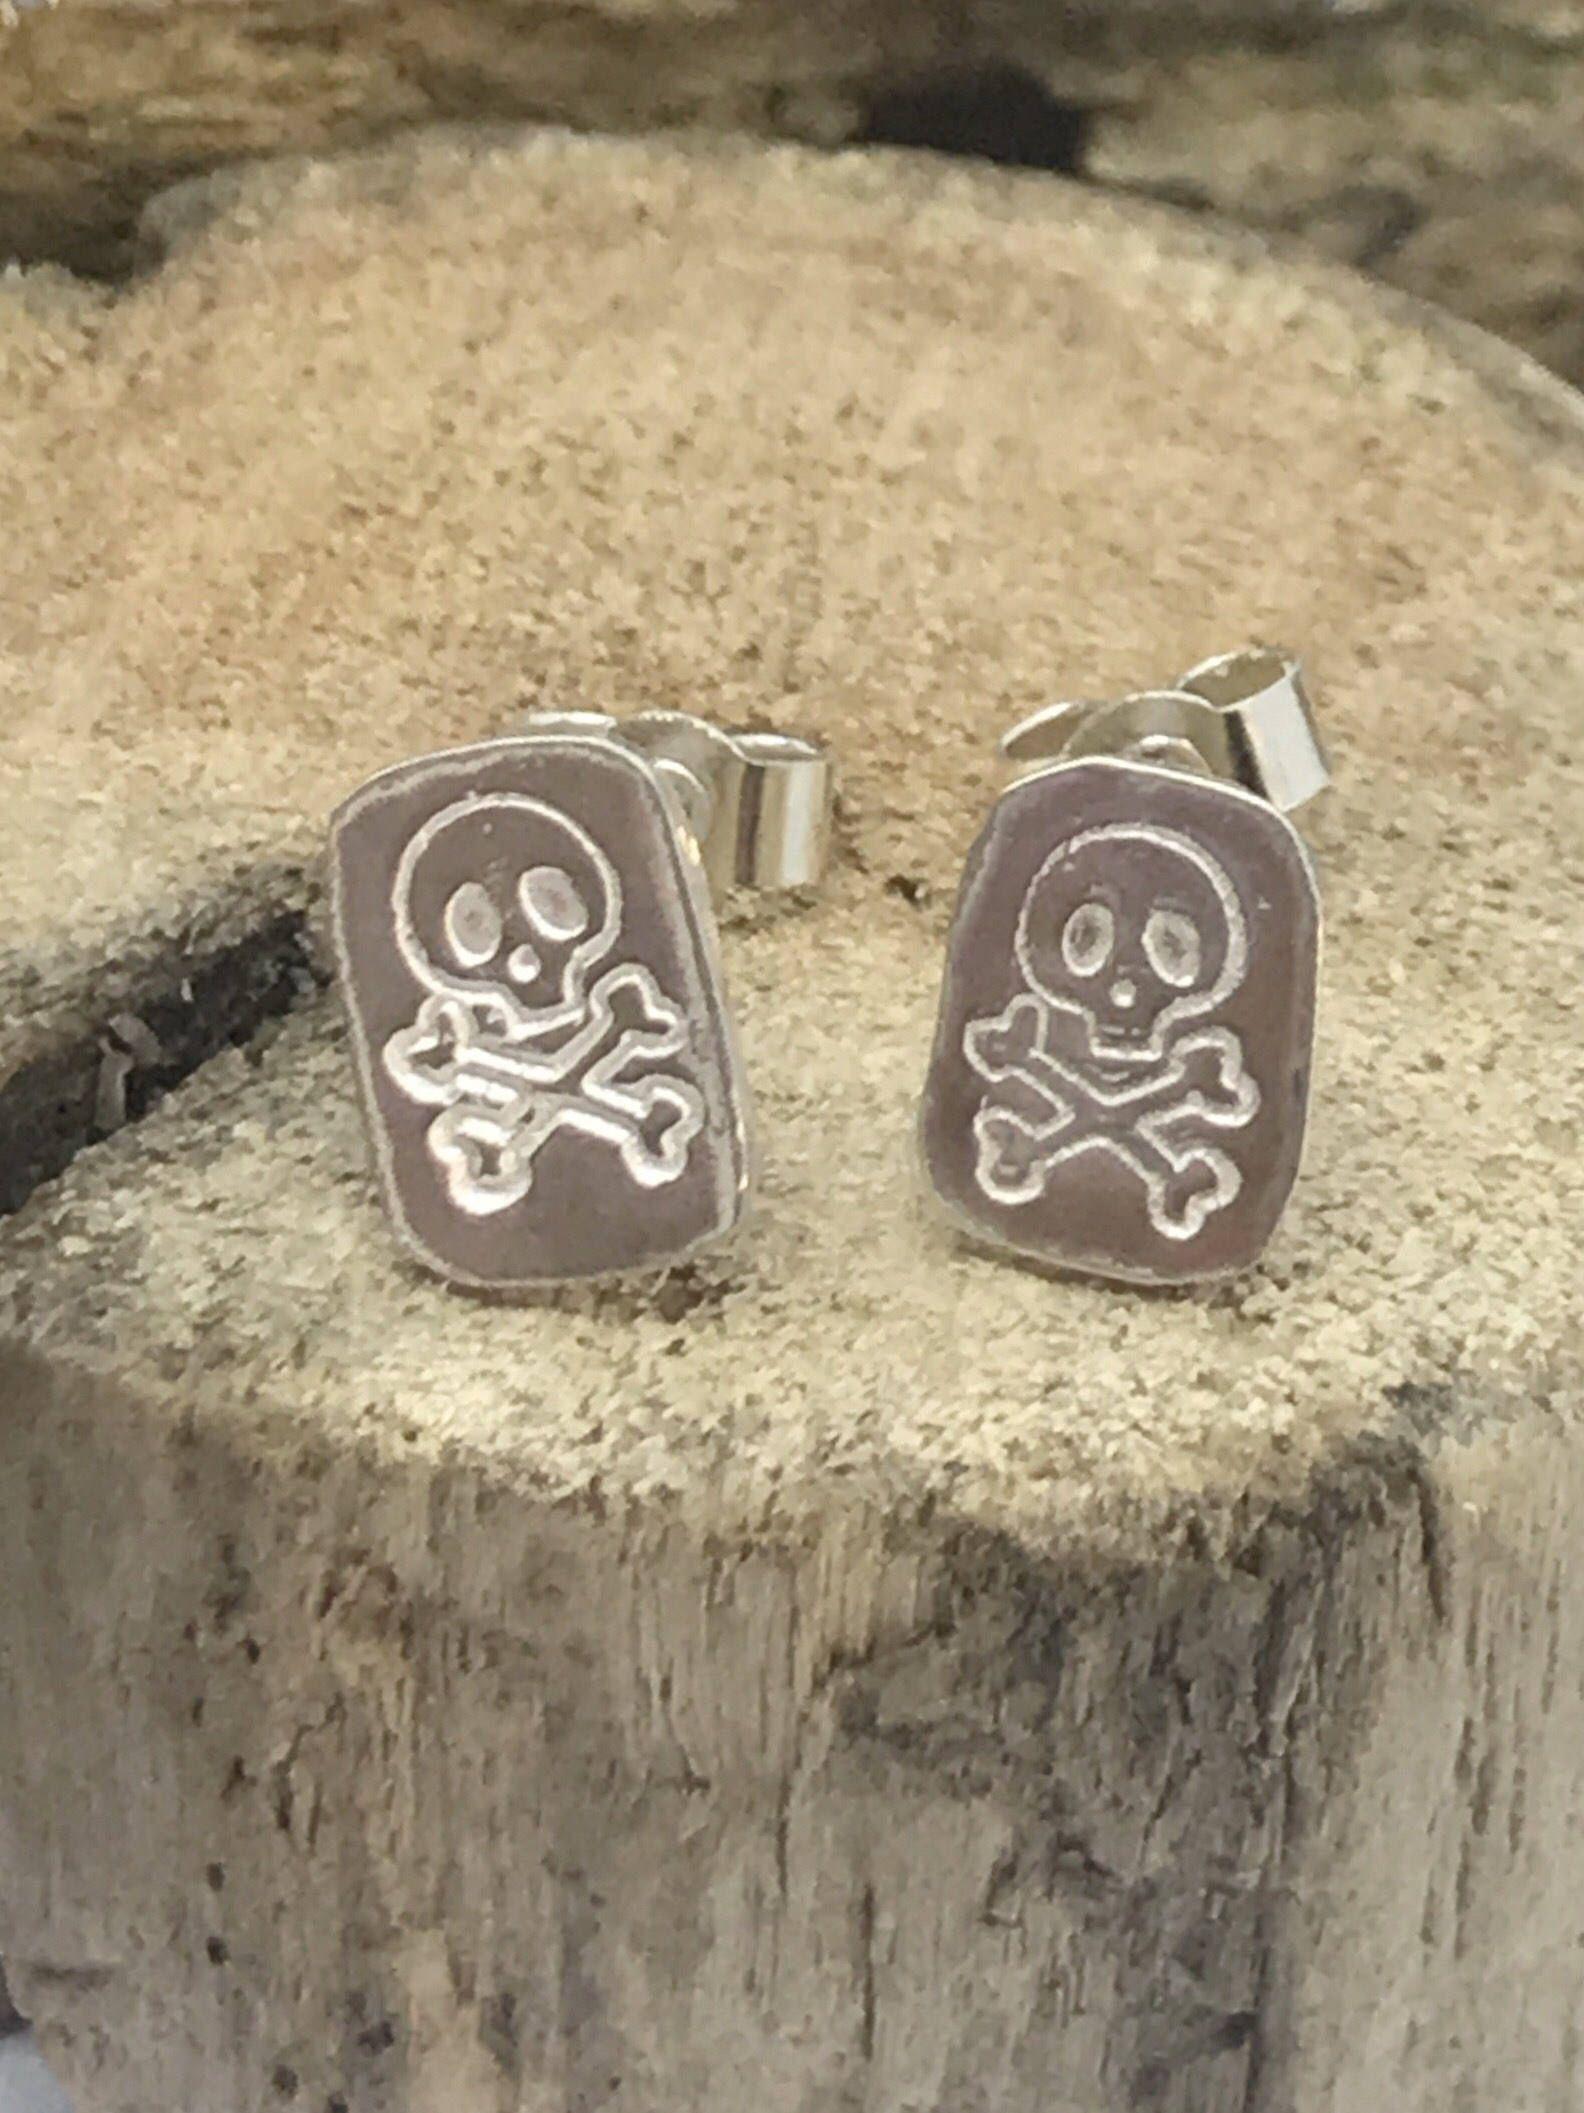 Skull And Crossbones Earrings 925 Sterling Silver Jewellery Handmade Stud